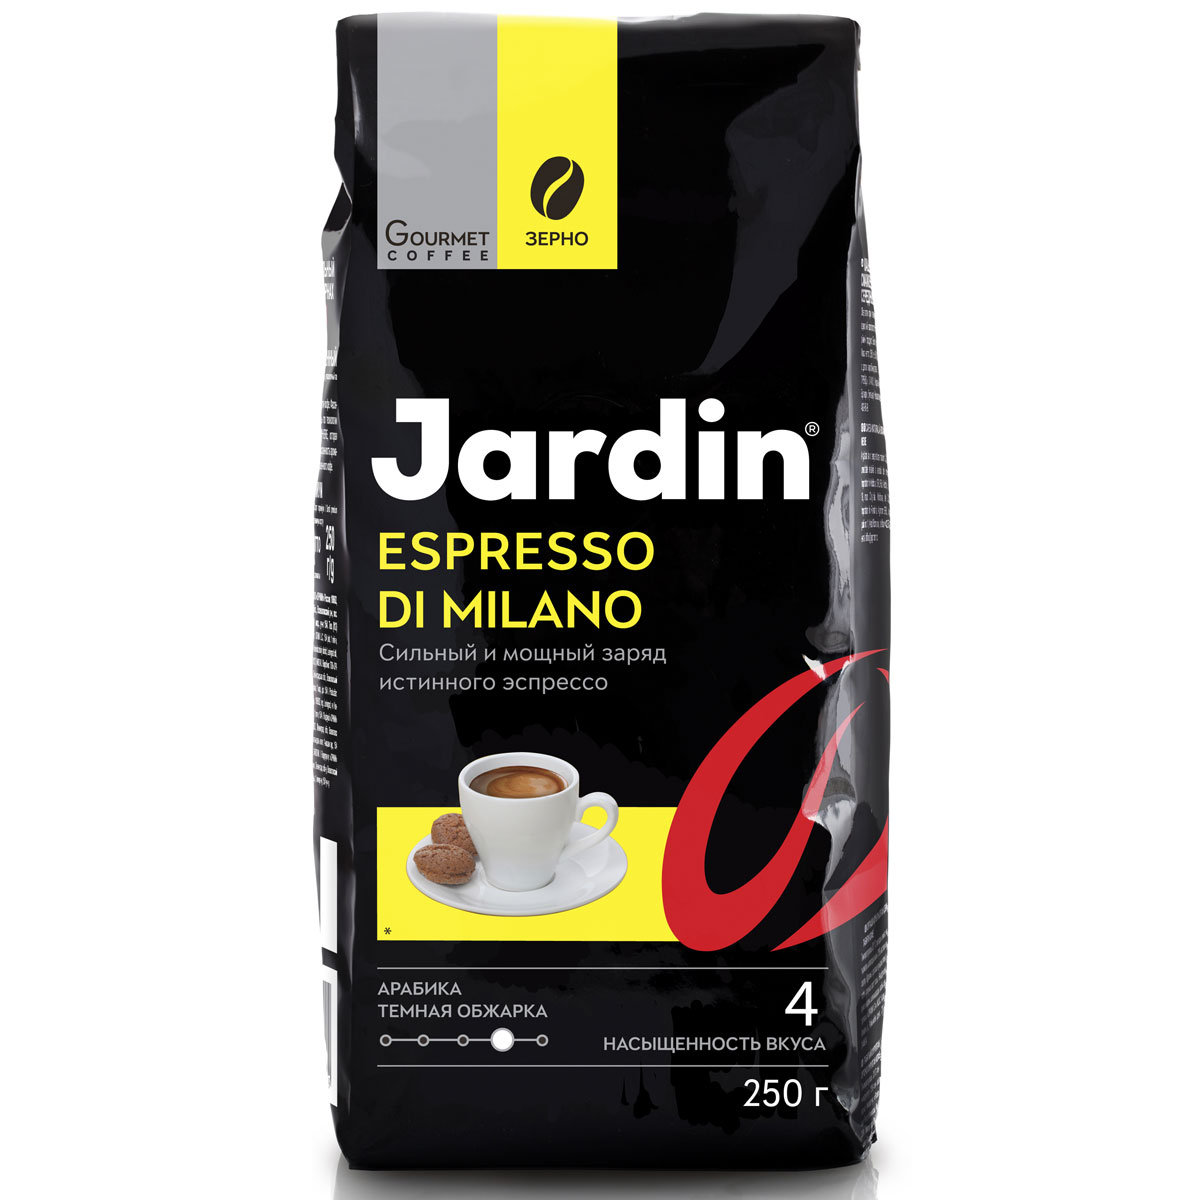 Jardin Espresso Di Milano кофе в зернах, 250 г espresso 2 esercizi supplementari